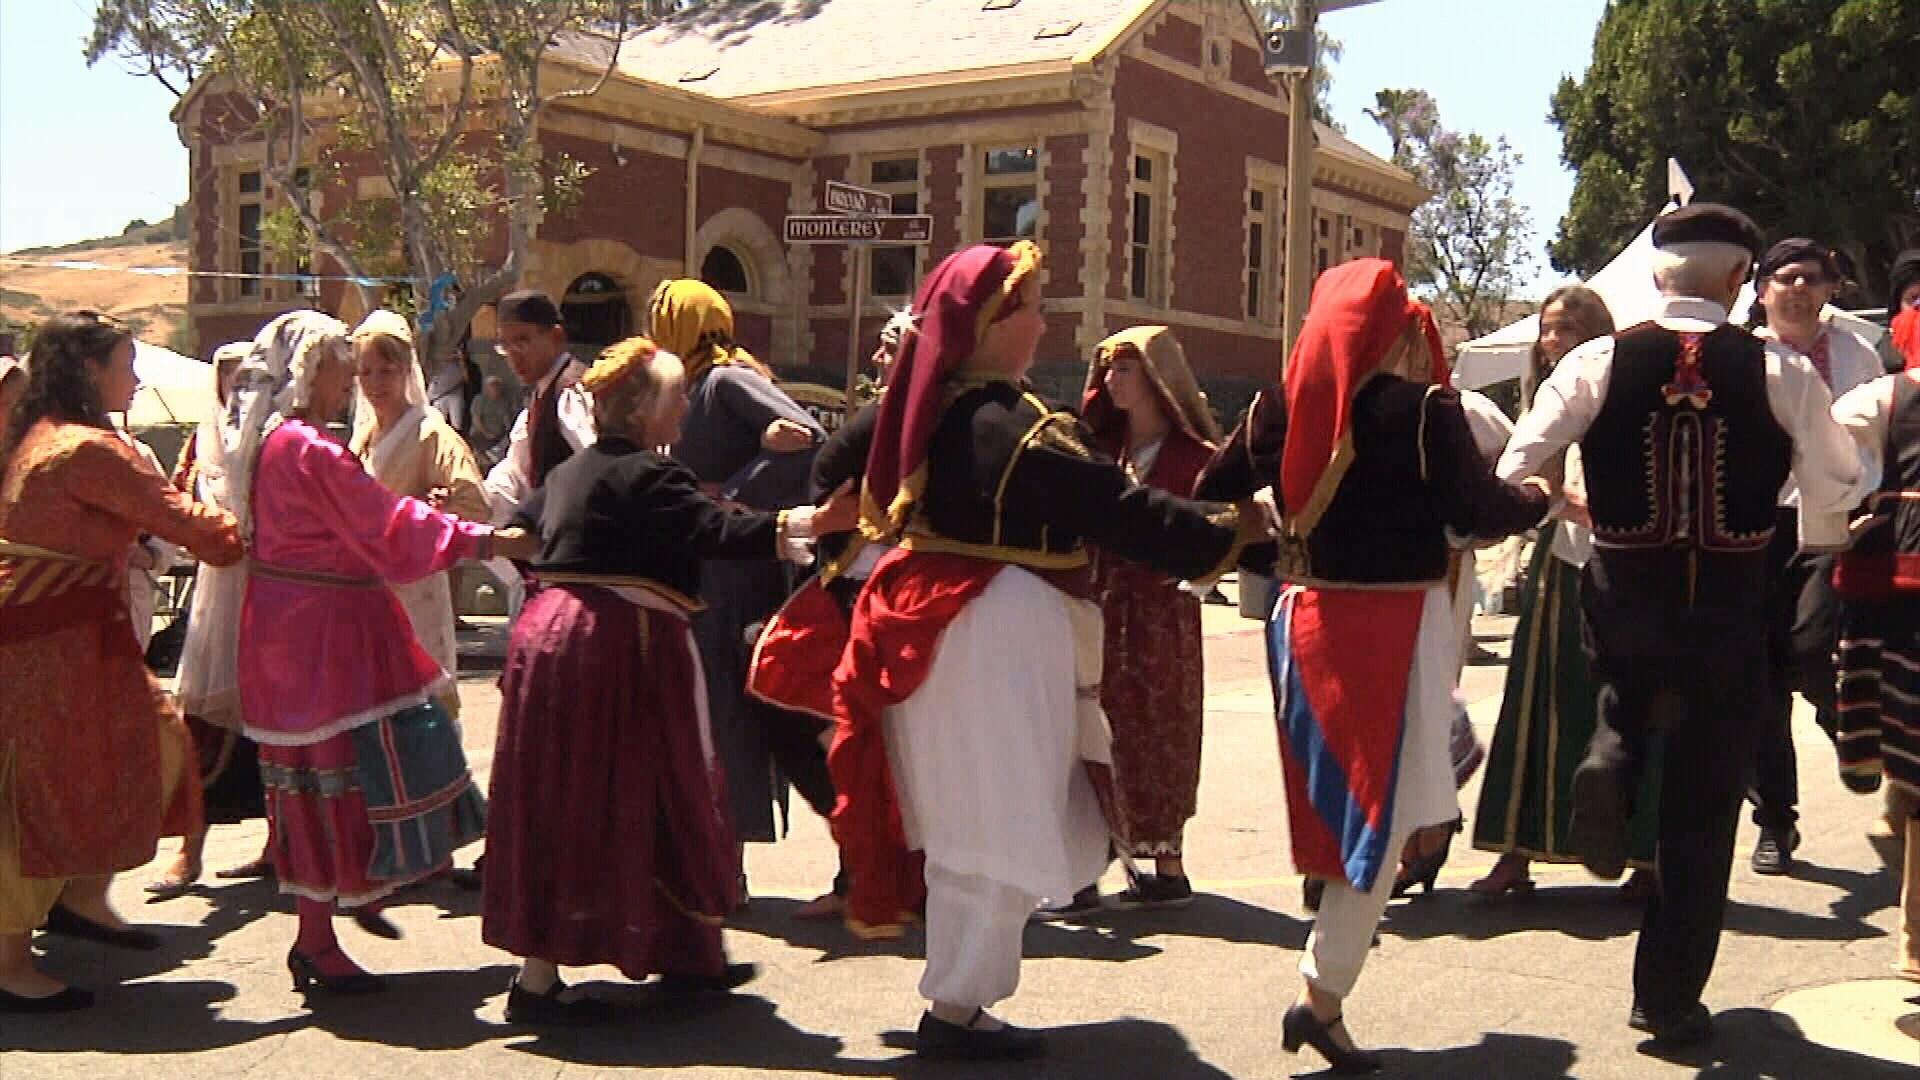 Madonna fashion show san luis obispo - Dancers At The 2016 San Luis Obispo Greek Festival Ksby Photo